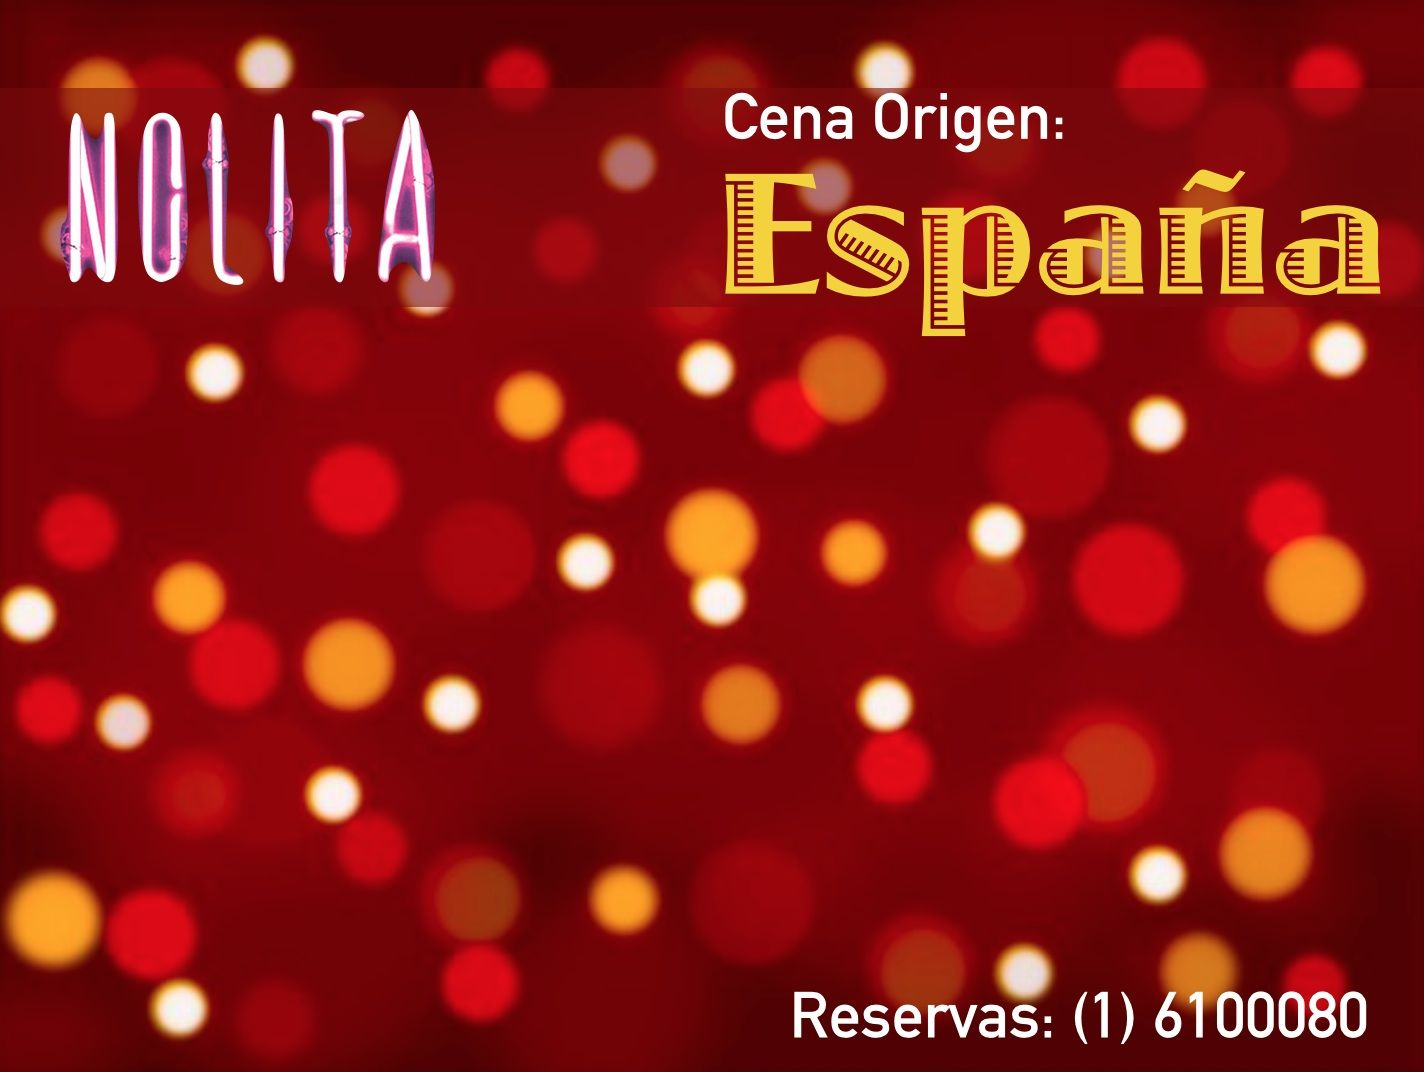 Cena Origen España Julio 2014